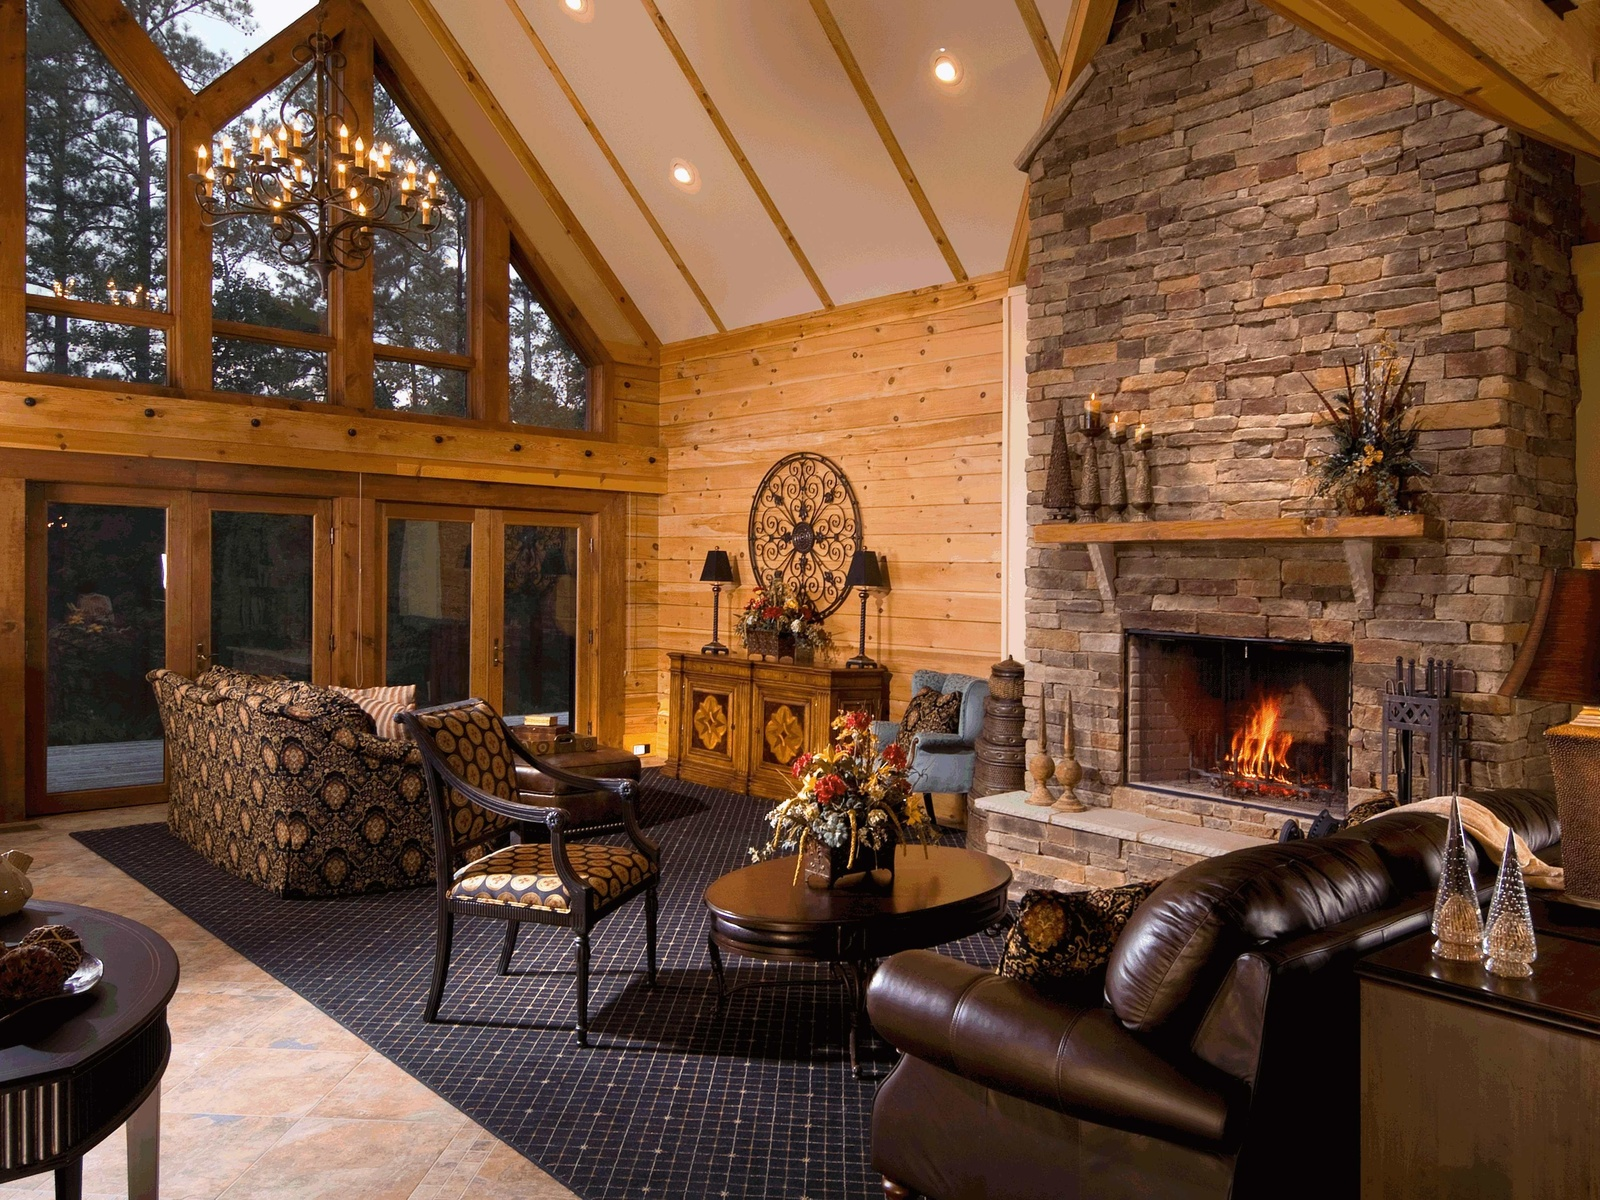 Modern farmhouse fireplace: architect's advice and design ideas